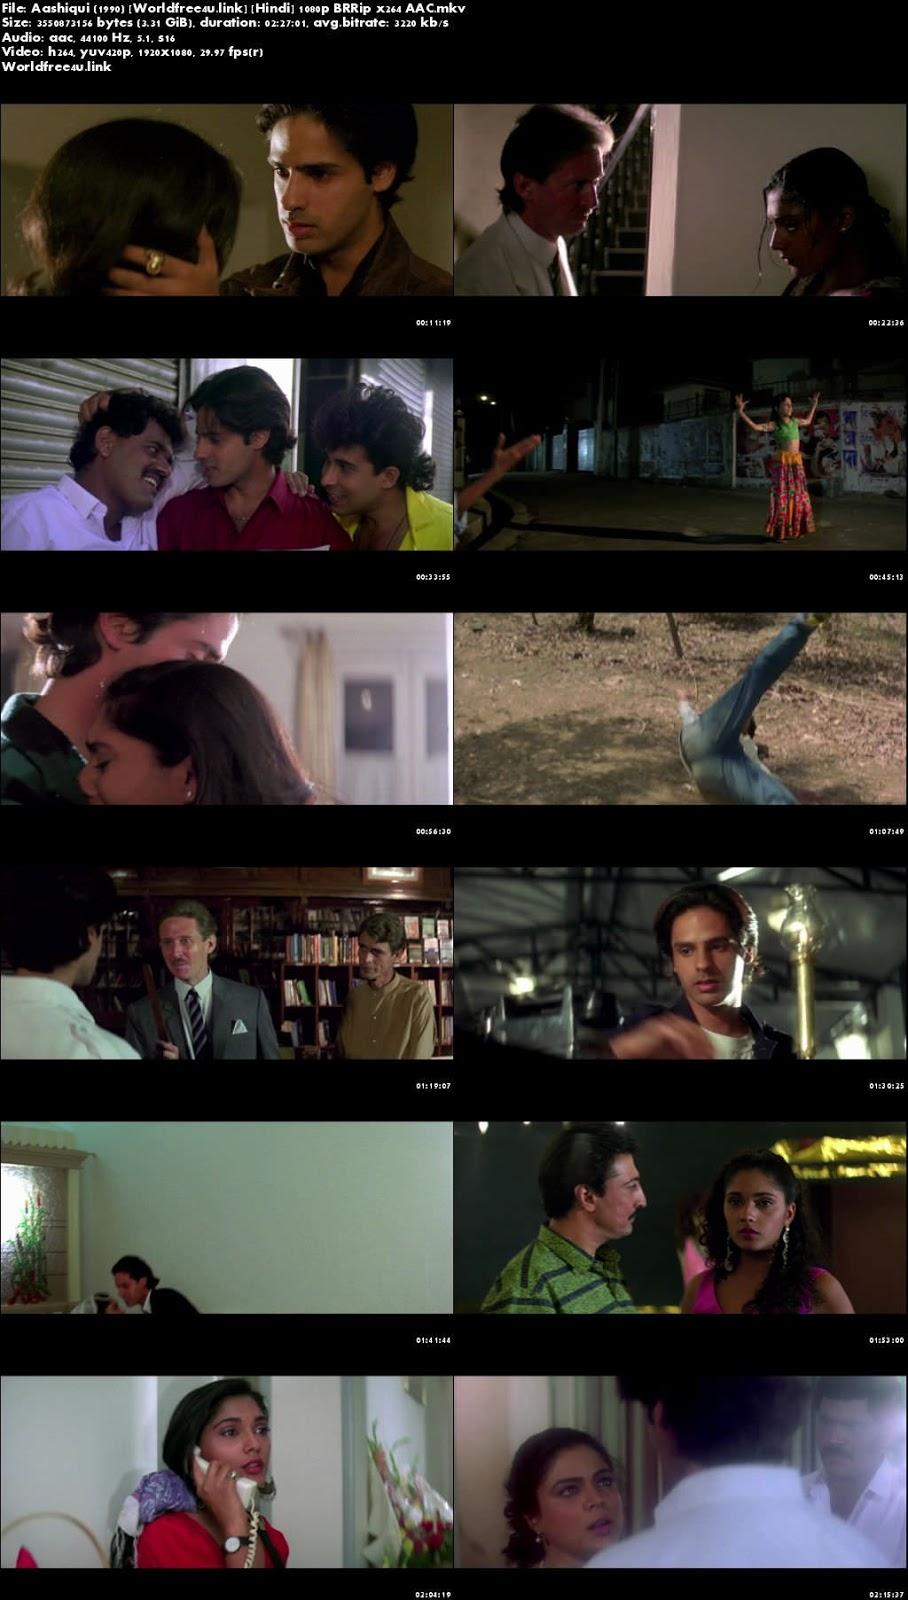 Screen Shots Aashiqui 1990 Hindi HD 1080p